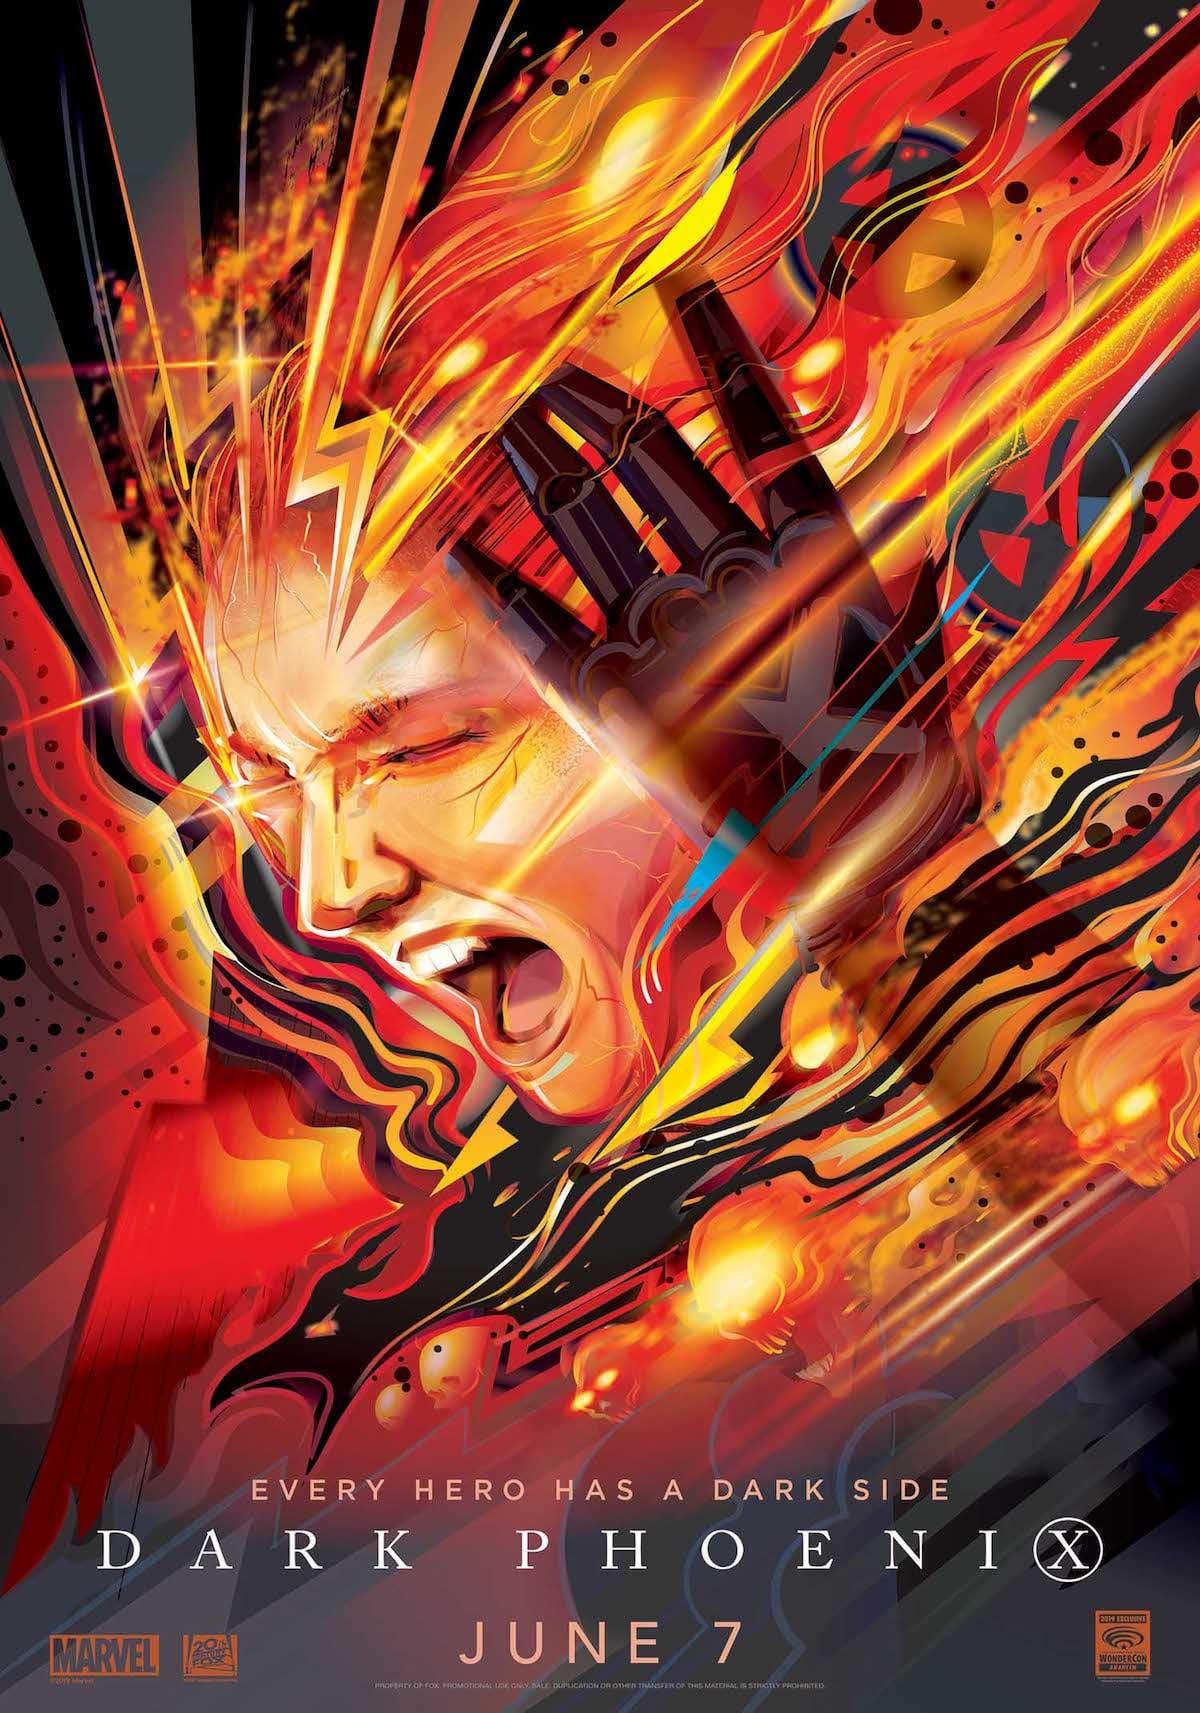 『X-MEN:ダーク・フェニックス』最新ポスター&特別映像解禁|キャスト陣がワンダーコンステージに登壇 film190405_xmendarkphoenix_main-1200x1713